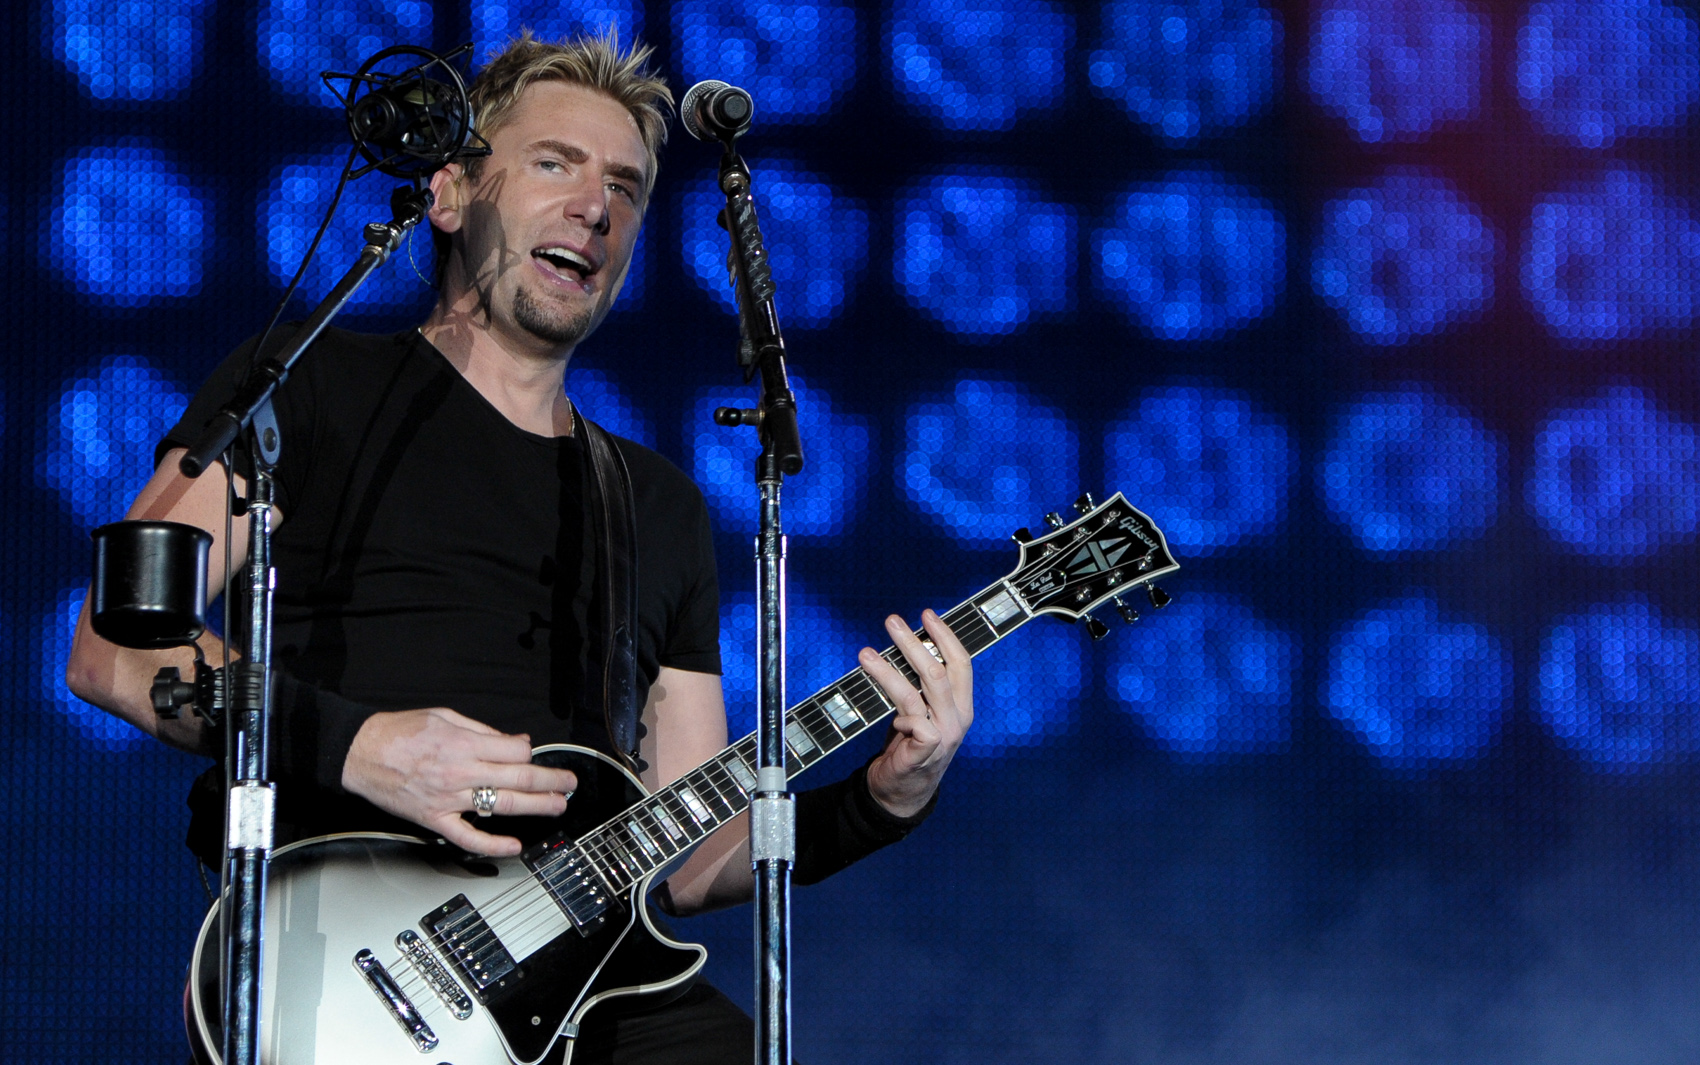 Banda canadense Nickelback é a terceira a se apresentar no Palco Mundo, nesta sexta-feira (20).